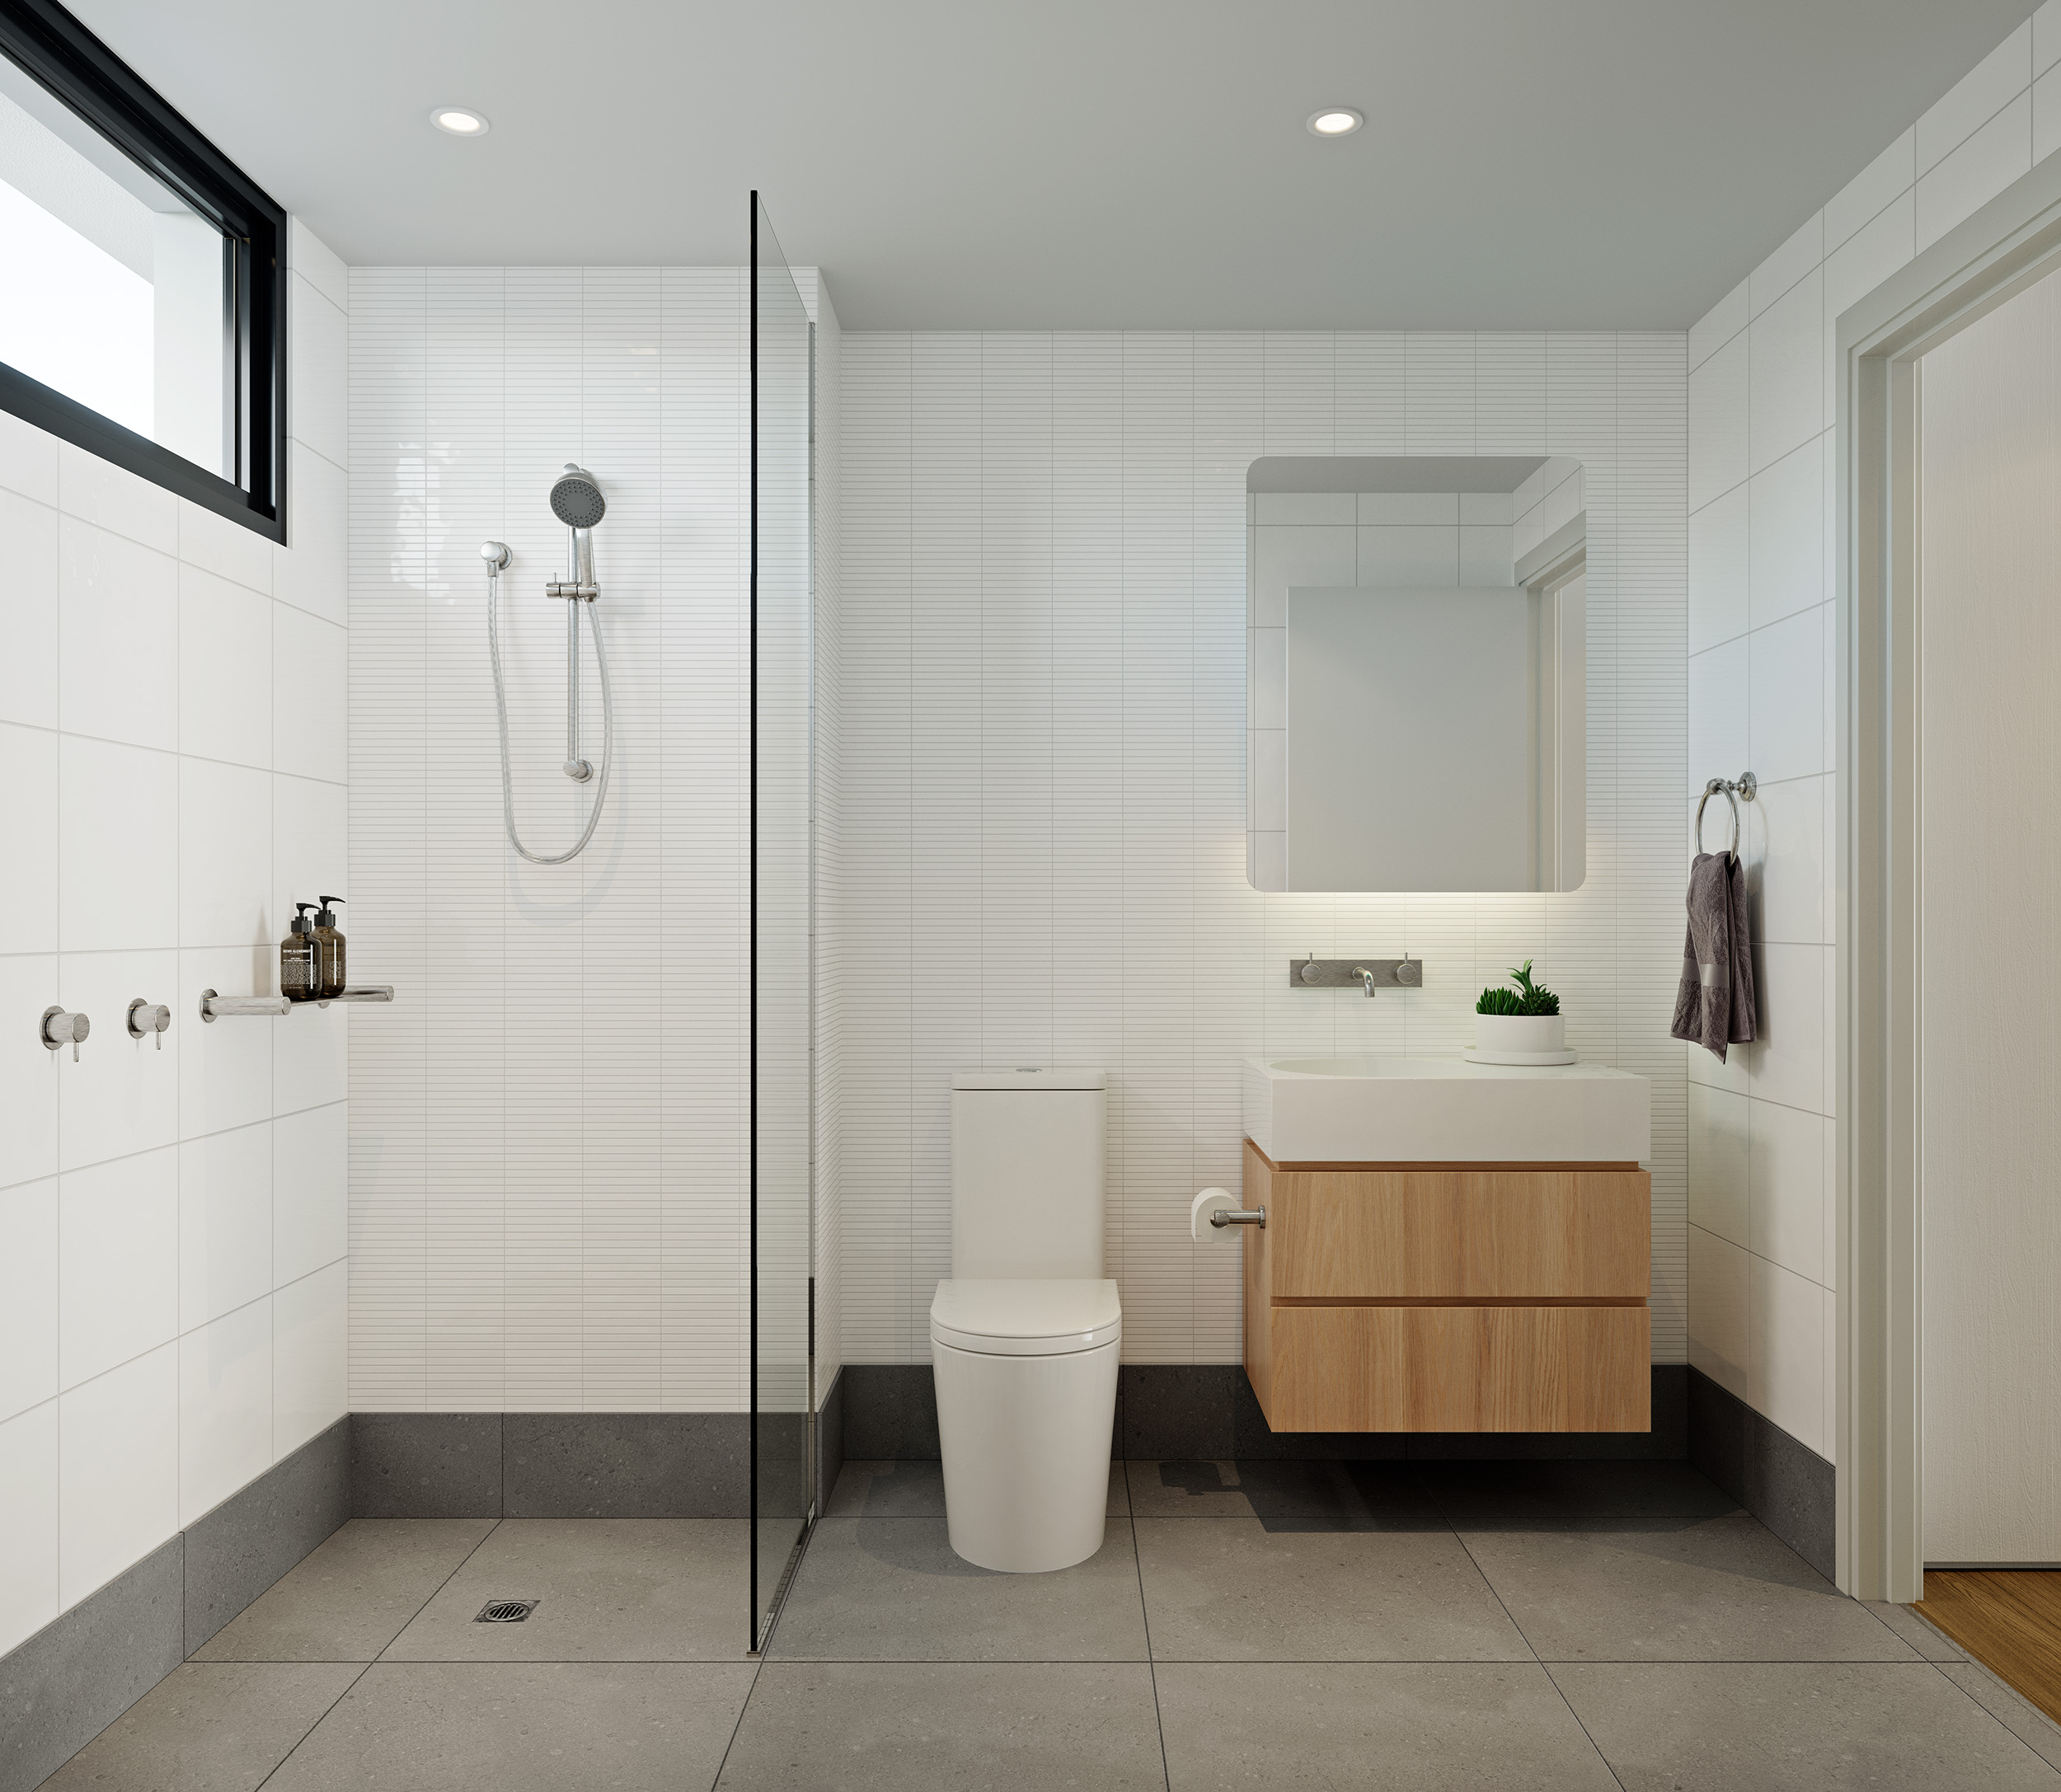 INT_20-22 Canterbury Rd_Bathroom_FINAL_lowres.jpg